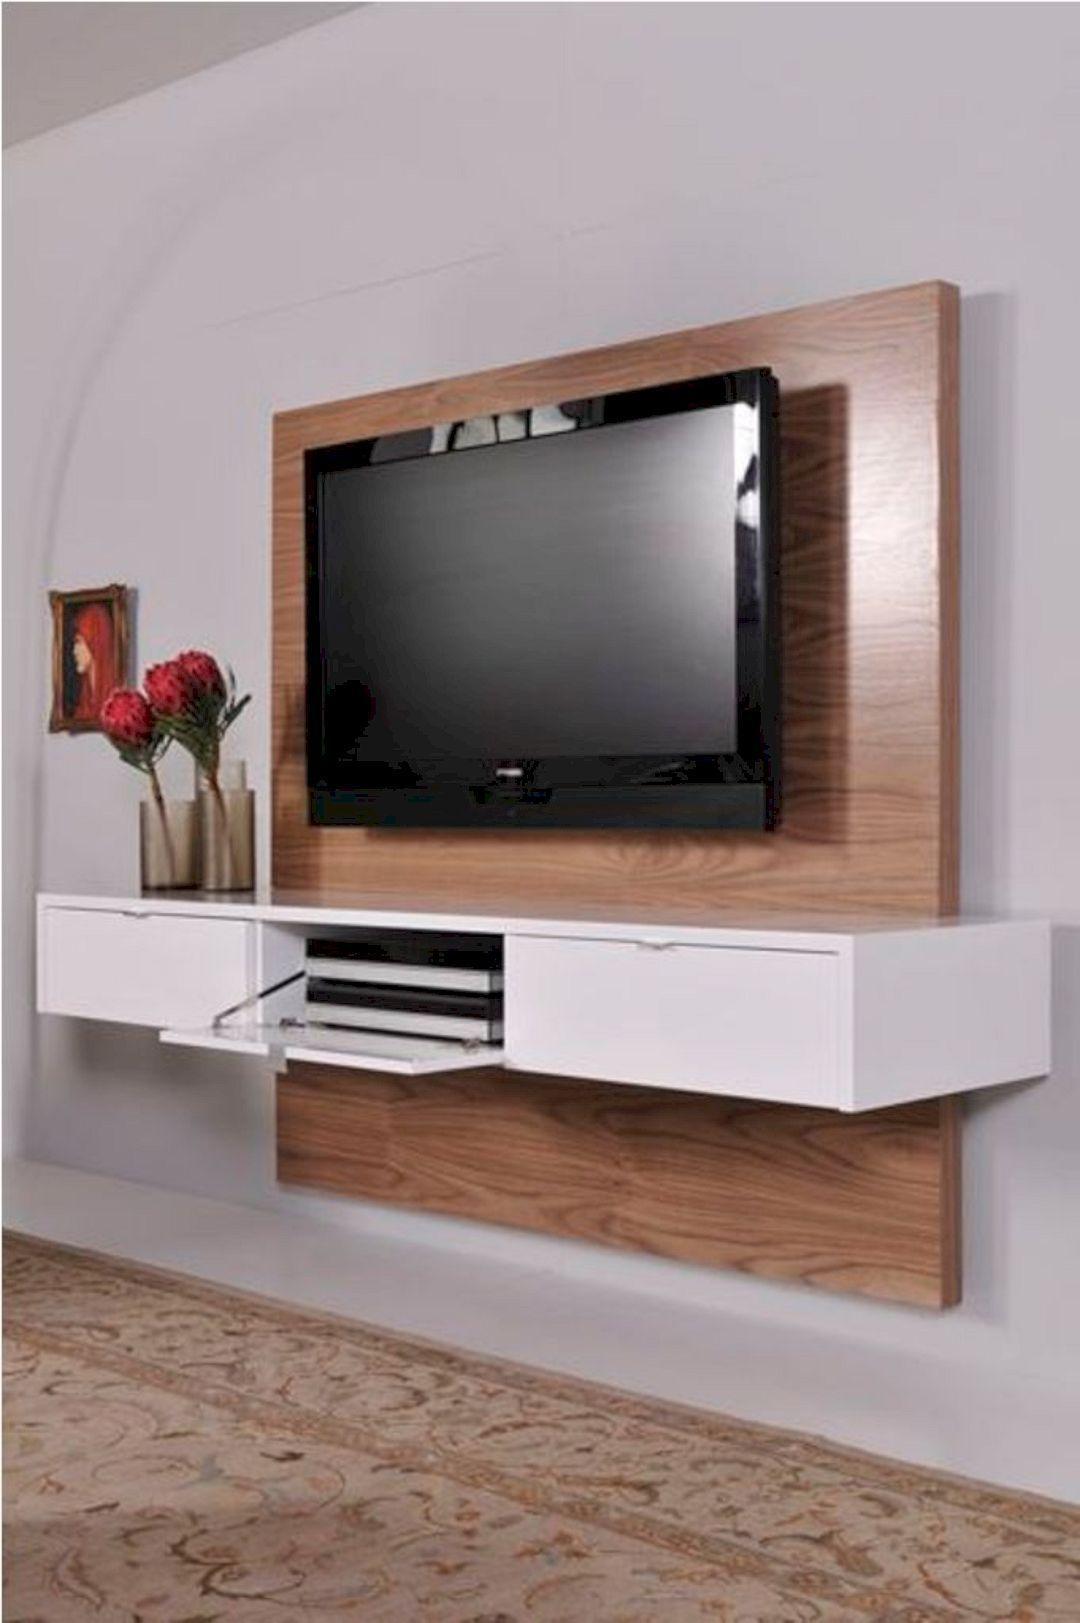 Living Room Interior Designs Tv Unit: 16 Interior Design Ideas For LED TV